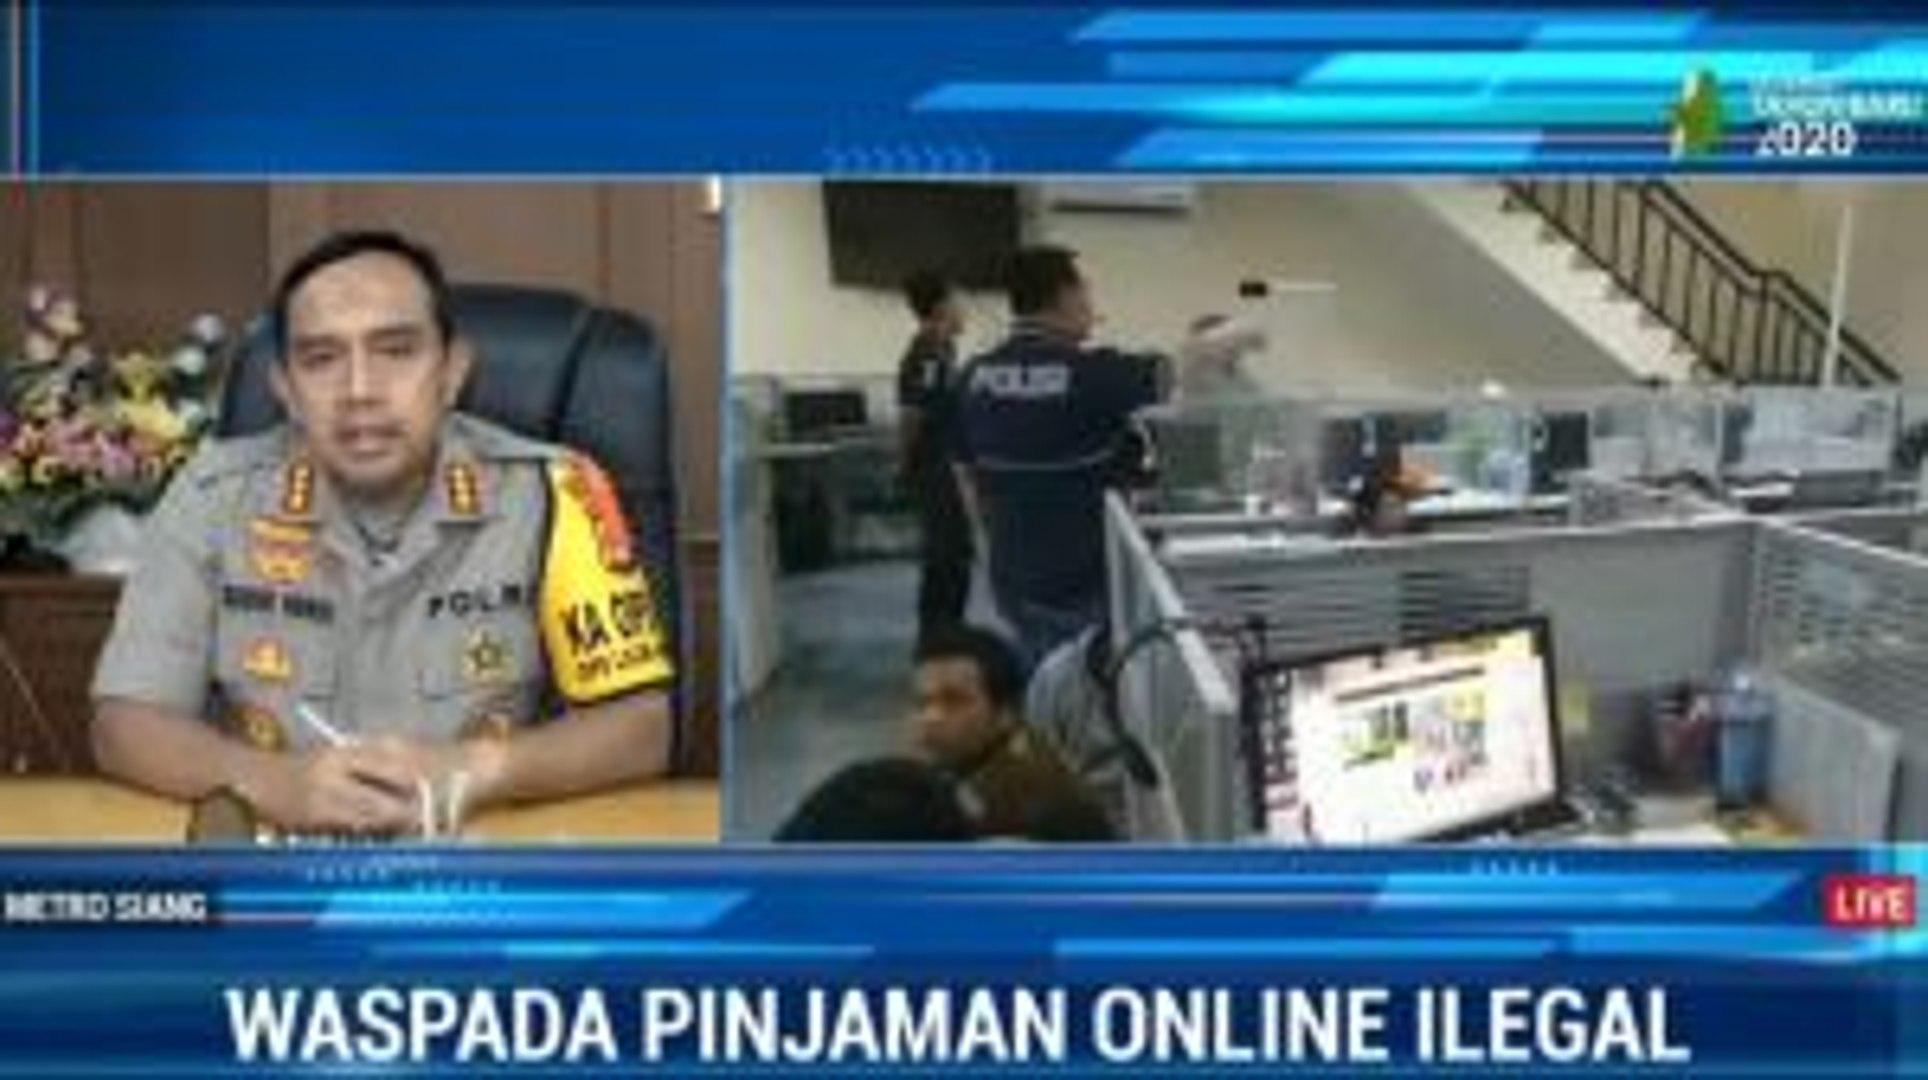 Polisi Usut Sumber Modal Pinjaman Online Ilegal Di Pluit Video